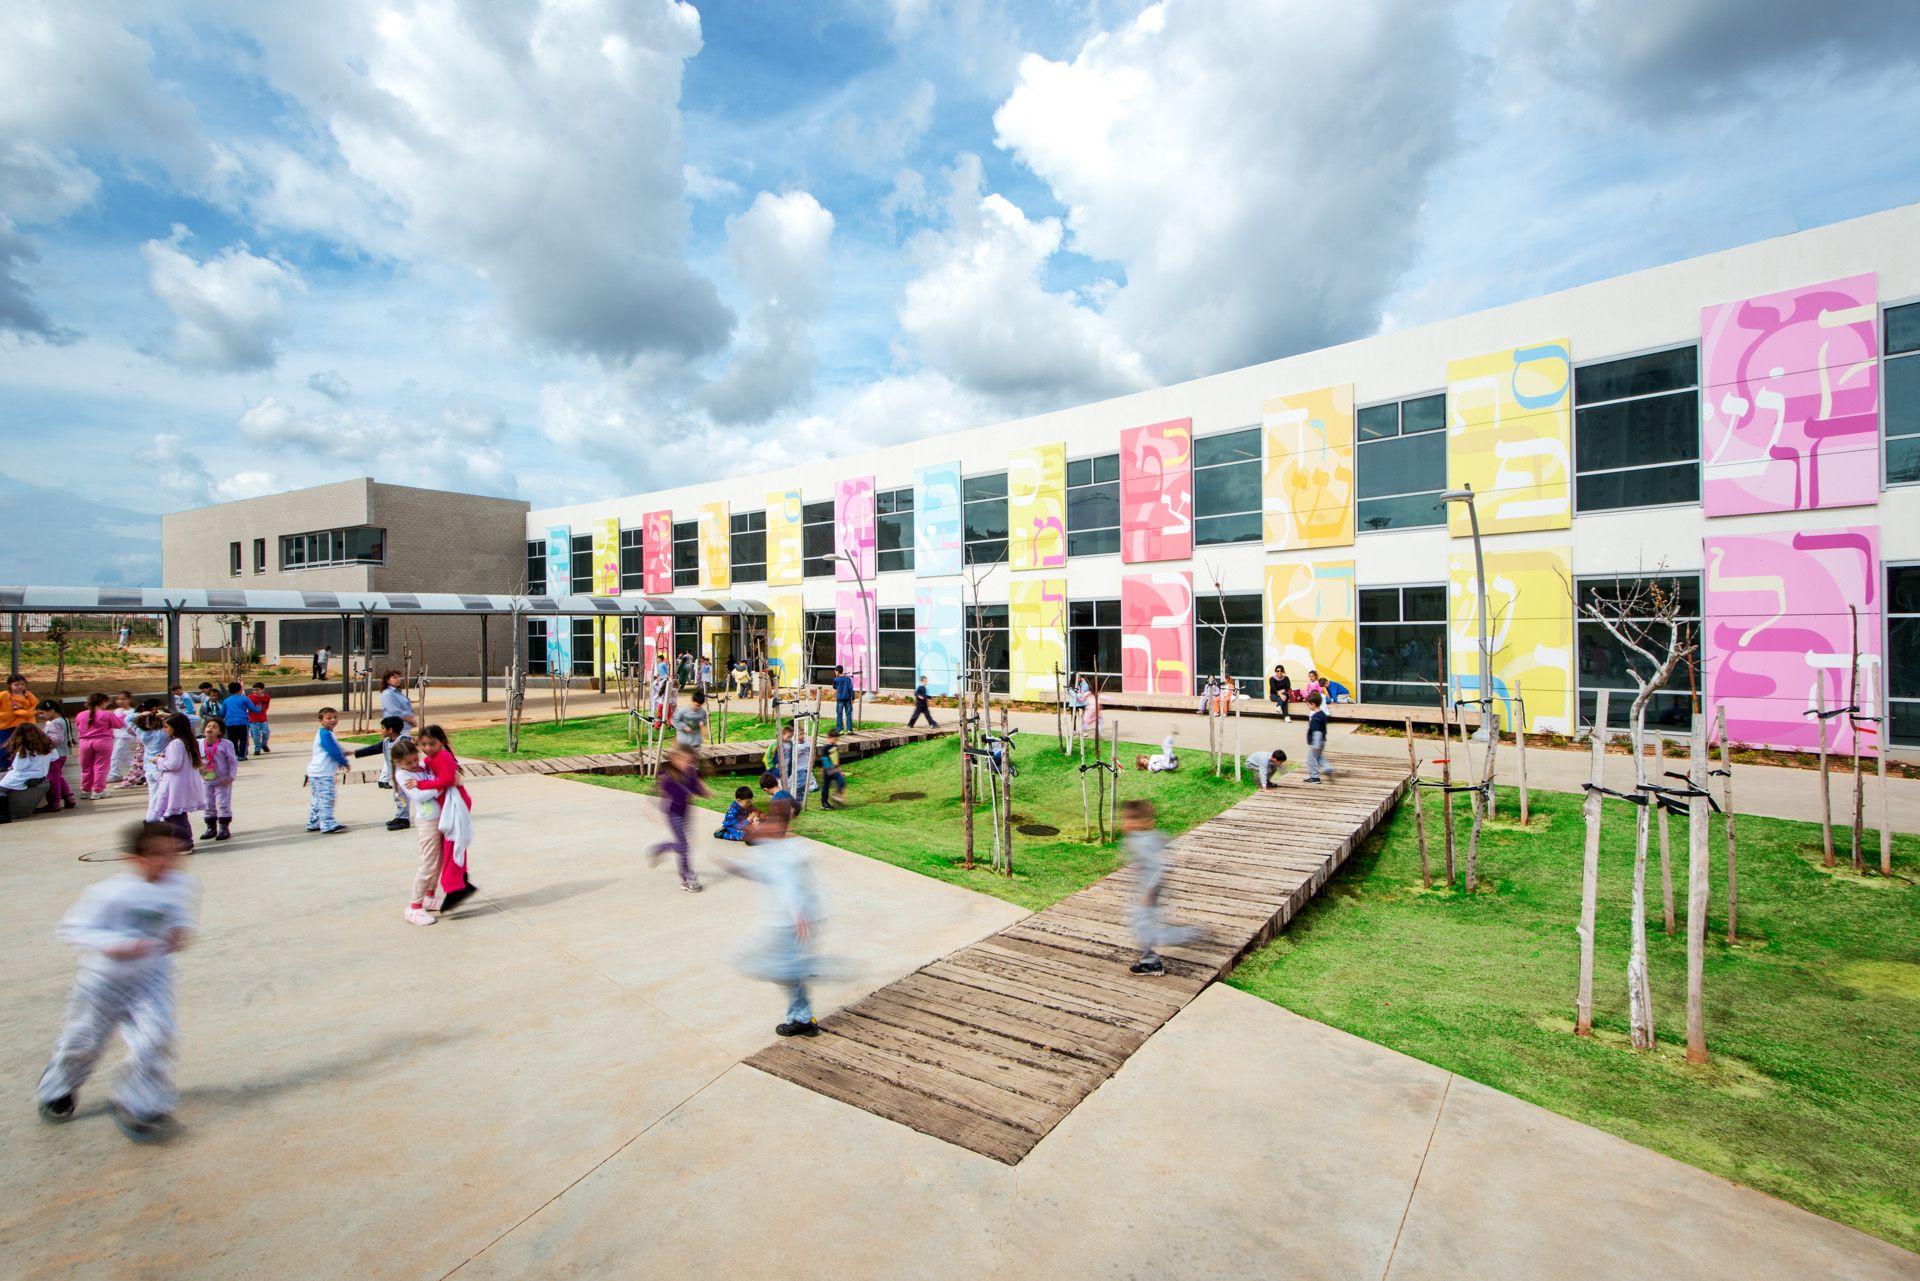 Kfar Saba School # Knafo Klimor Architects # Green School # Holistic  Approach# Sustainability